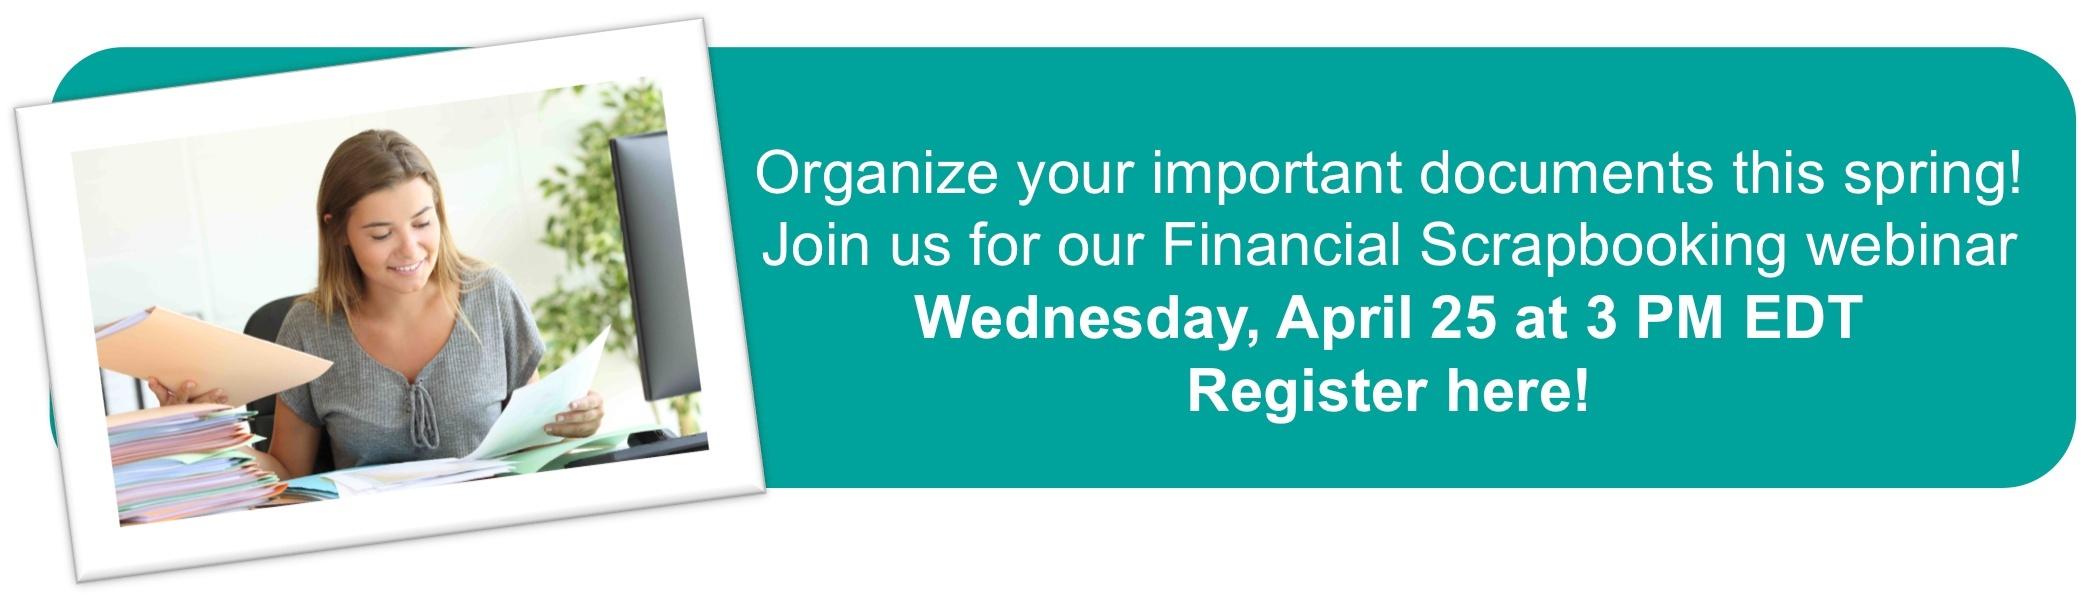 Financial Scrapbooking Webinar